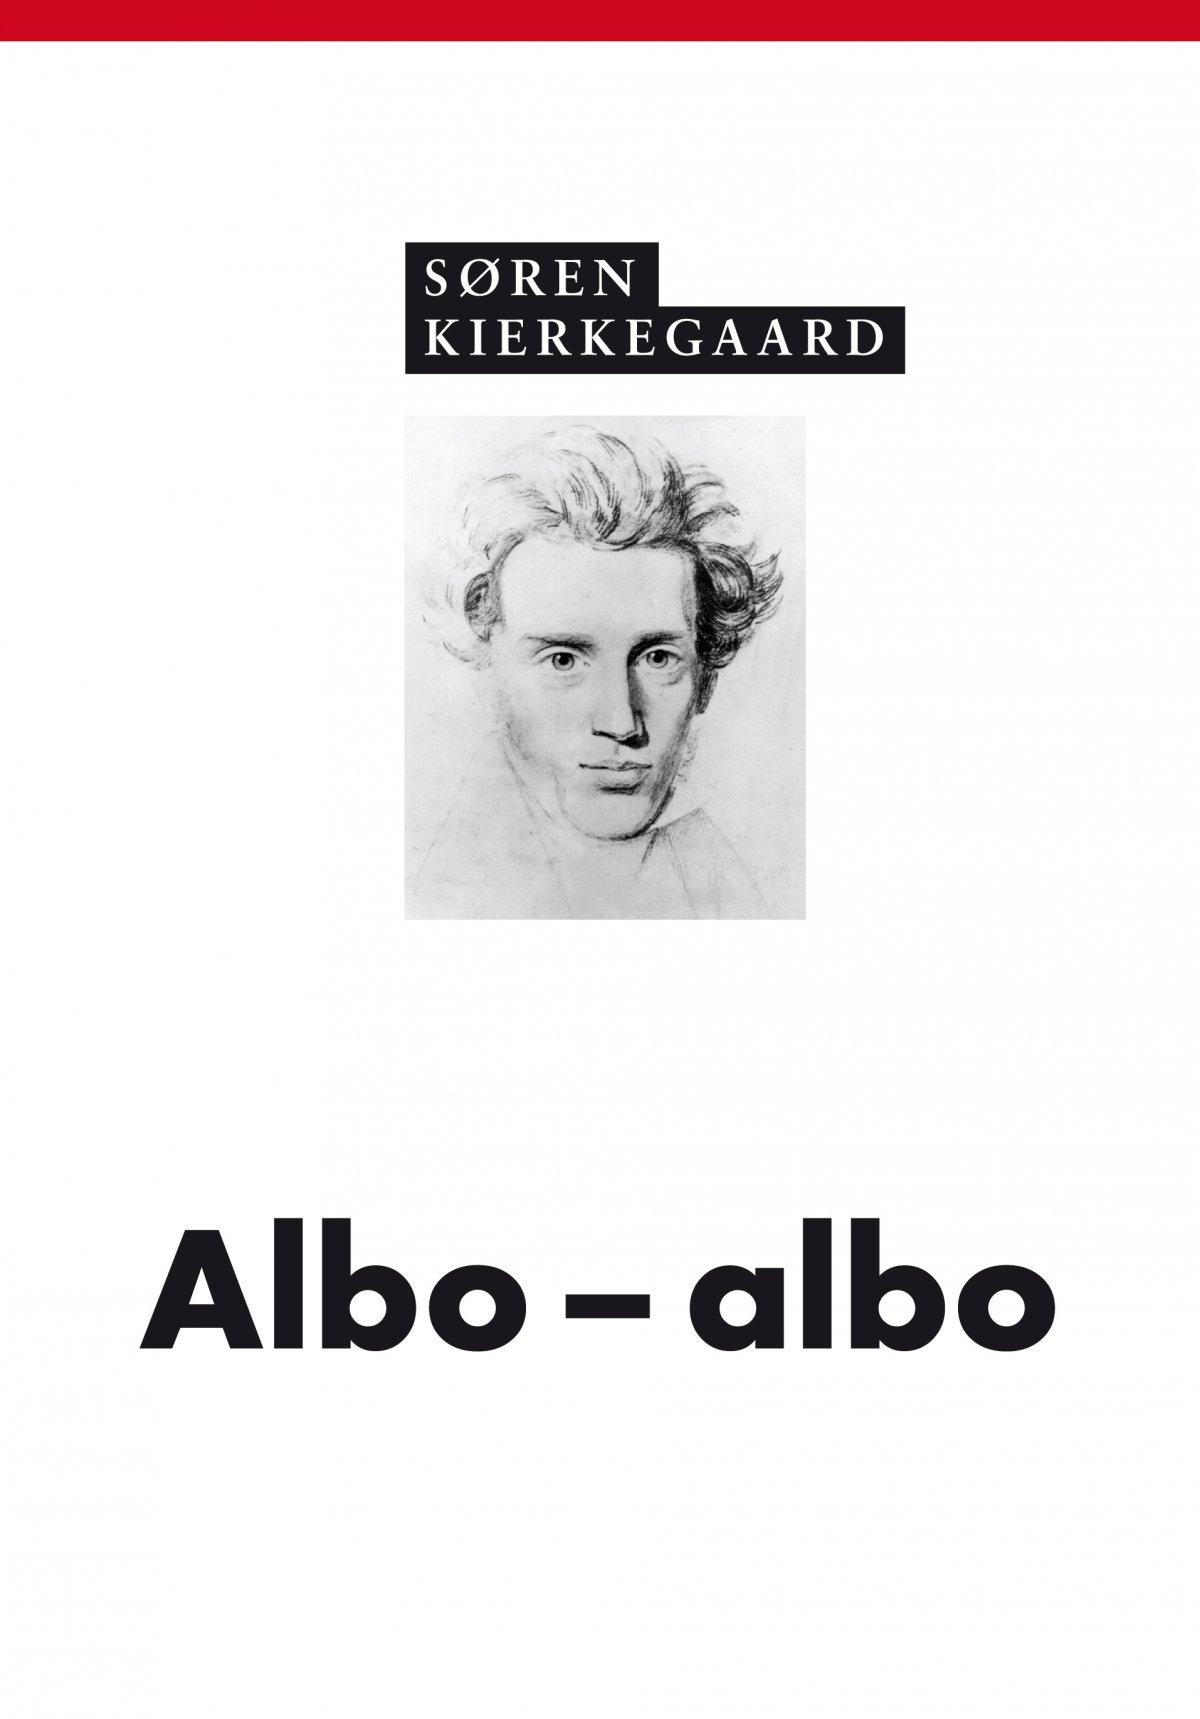 Albo - albo - Ebook (Książka EPUB) do pobrania w formacie EPUB